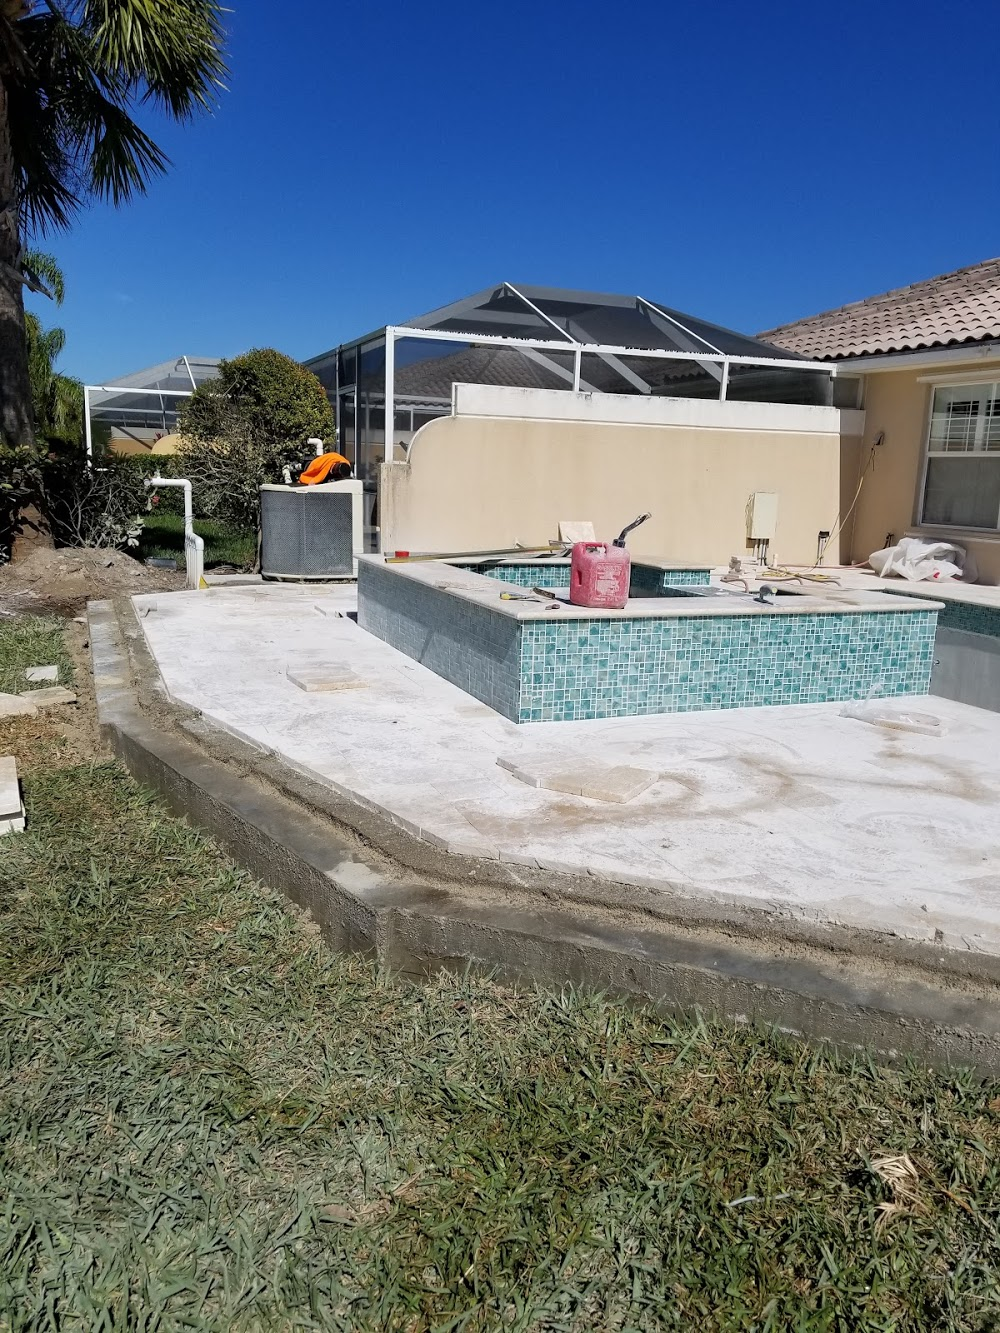 Pool & Deck Concepts